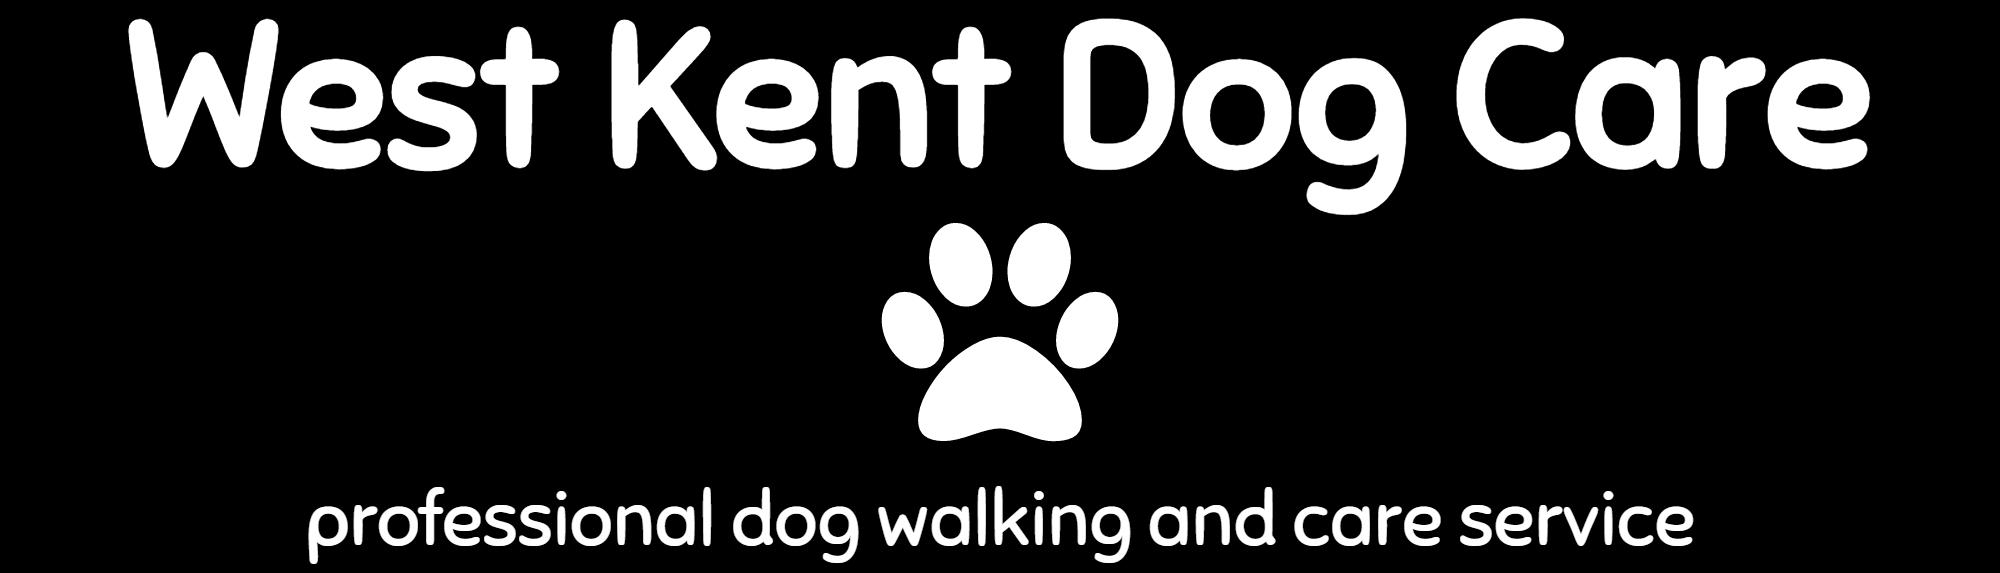 West Kent Dog Care-logo-white (2).png